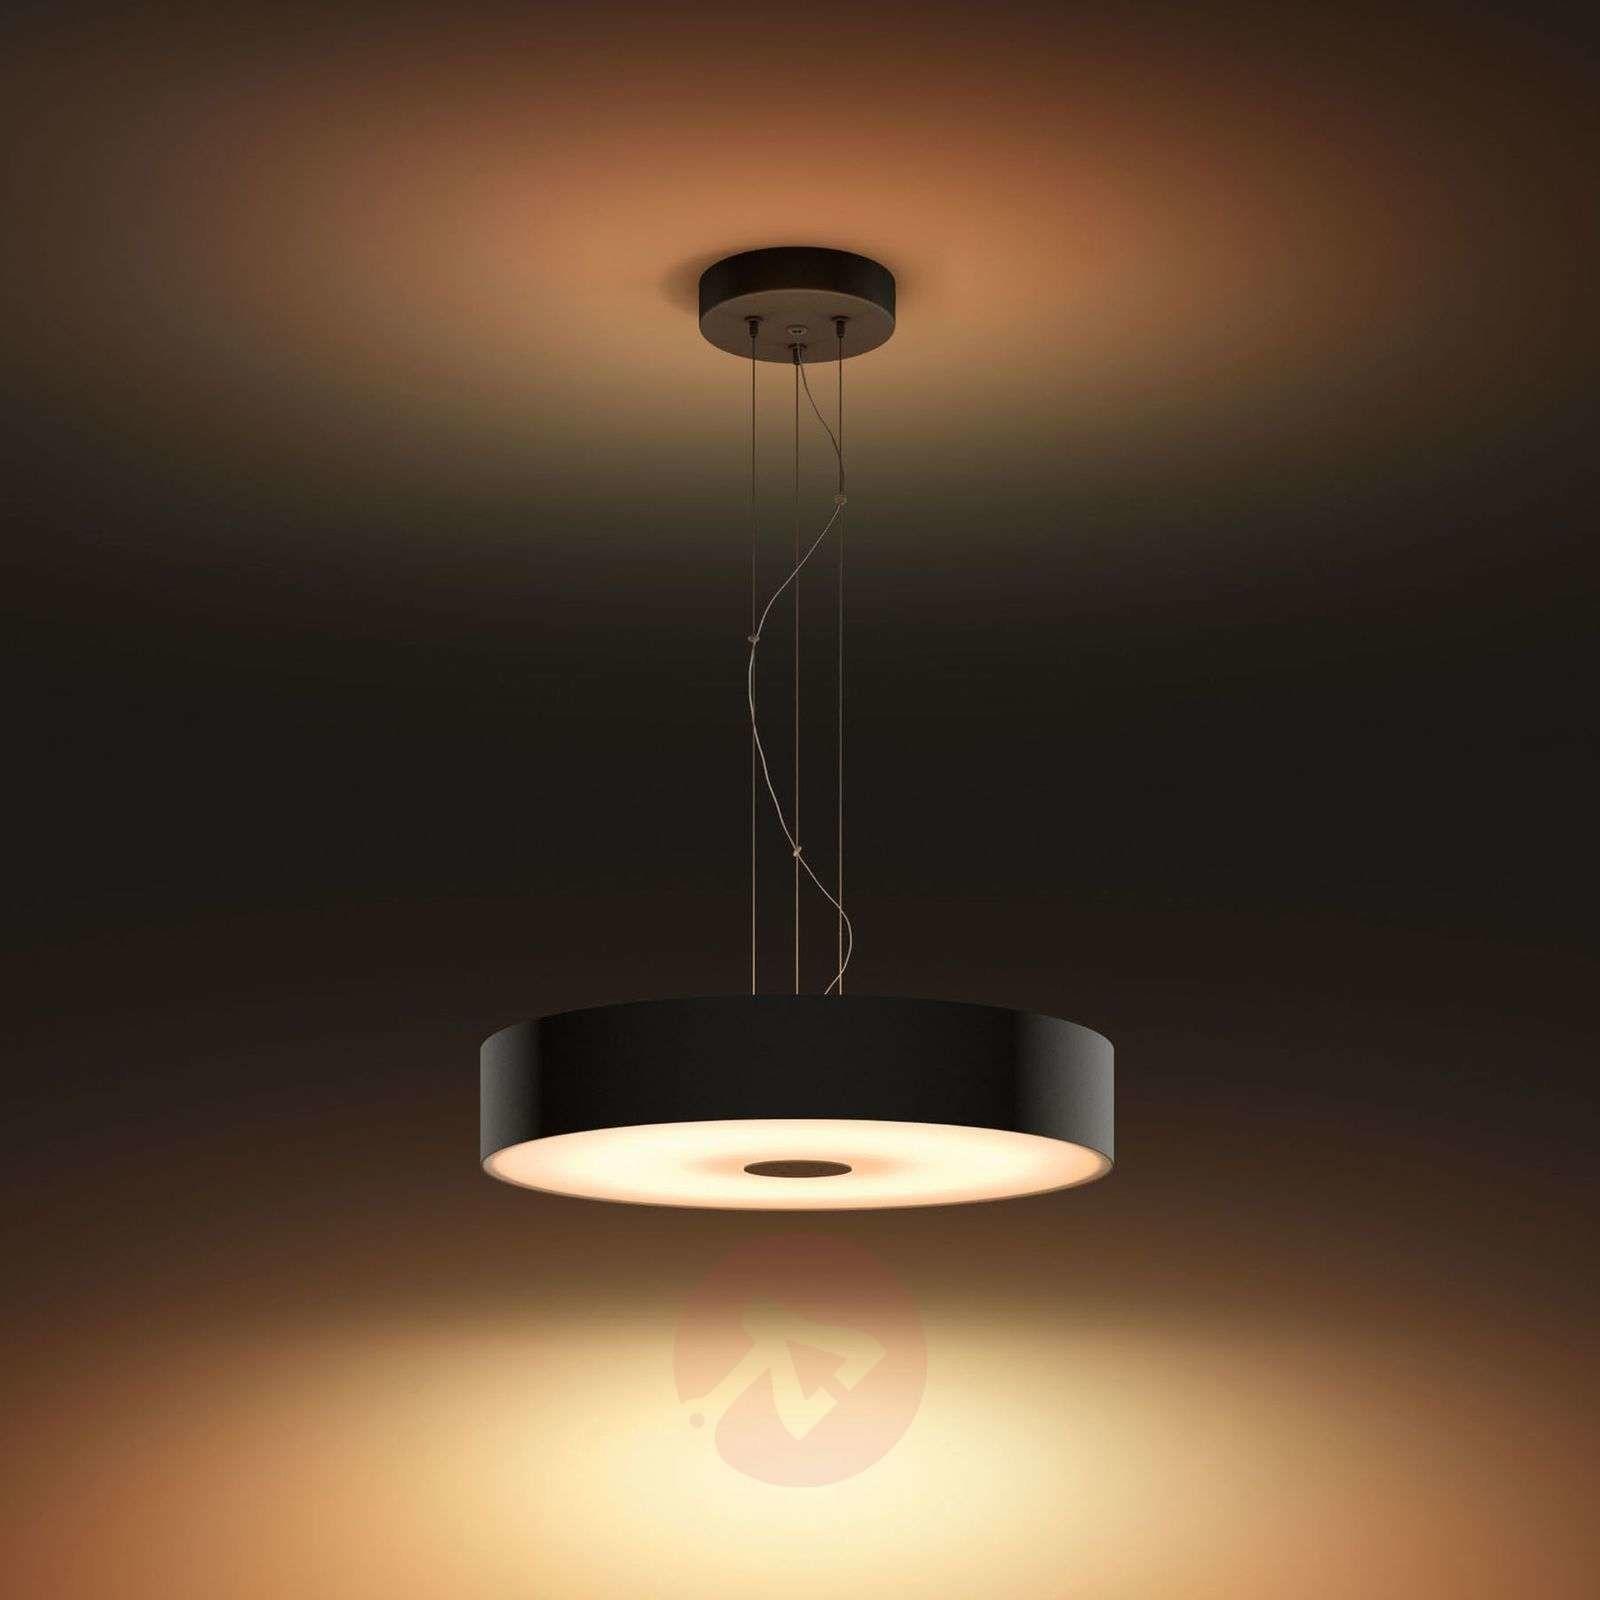 40339/30/P6 FAIR LAMPA WISZĄCA -WERSJA Z BLUETOOTH- PHILIPS HUE